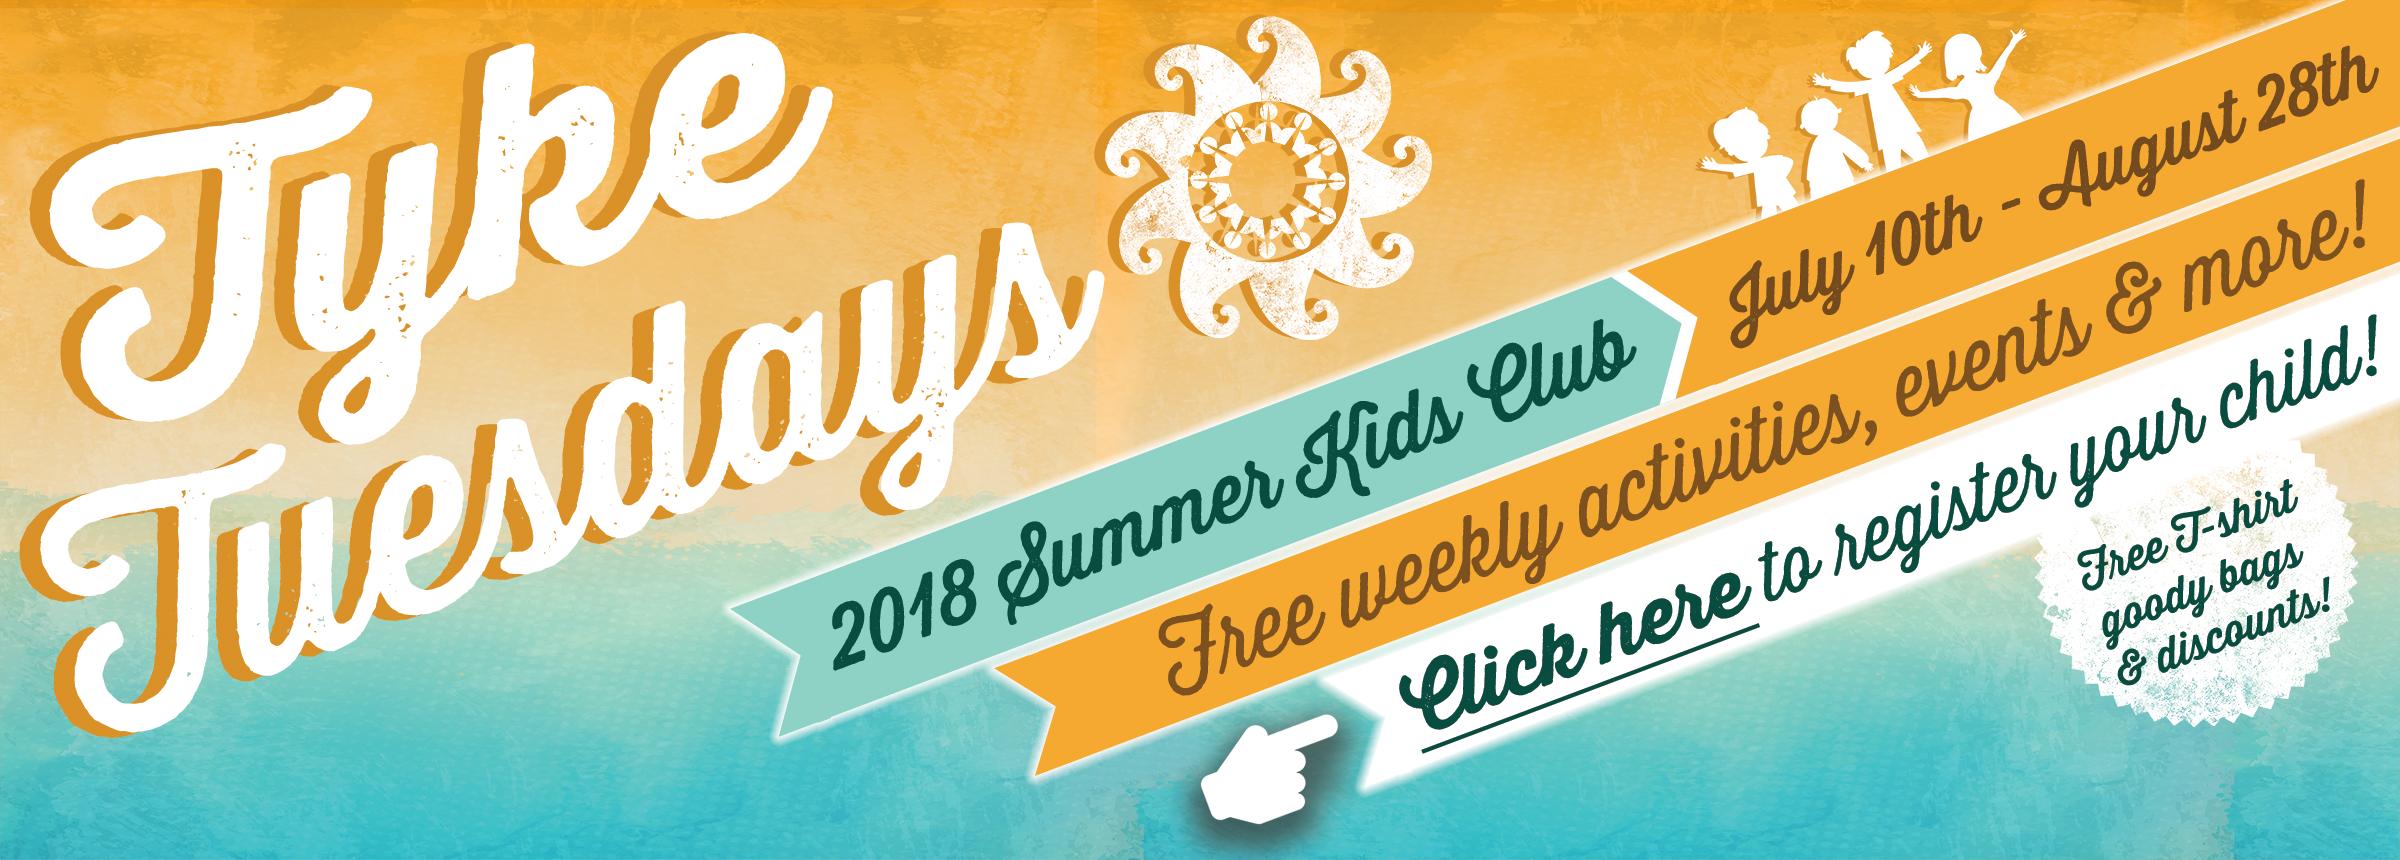 Summer Kids Club 2018_Hero Image_Website Home Page